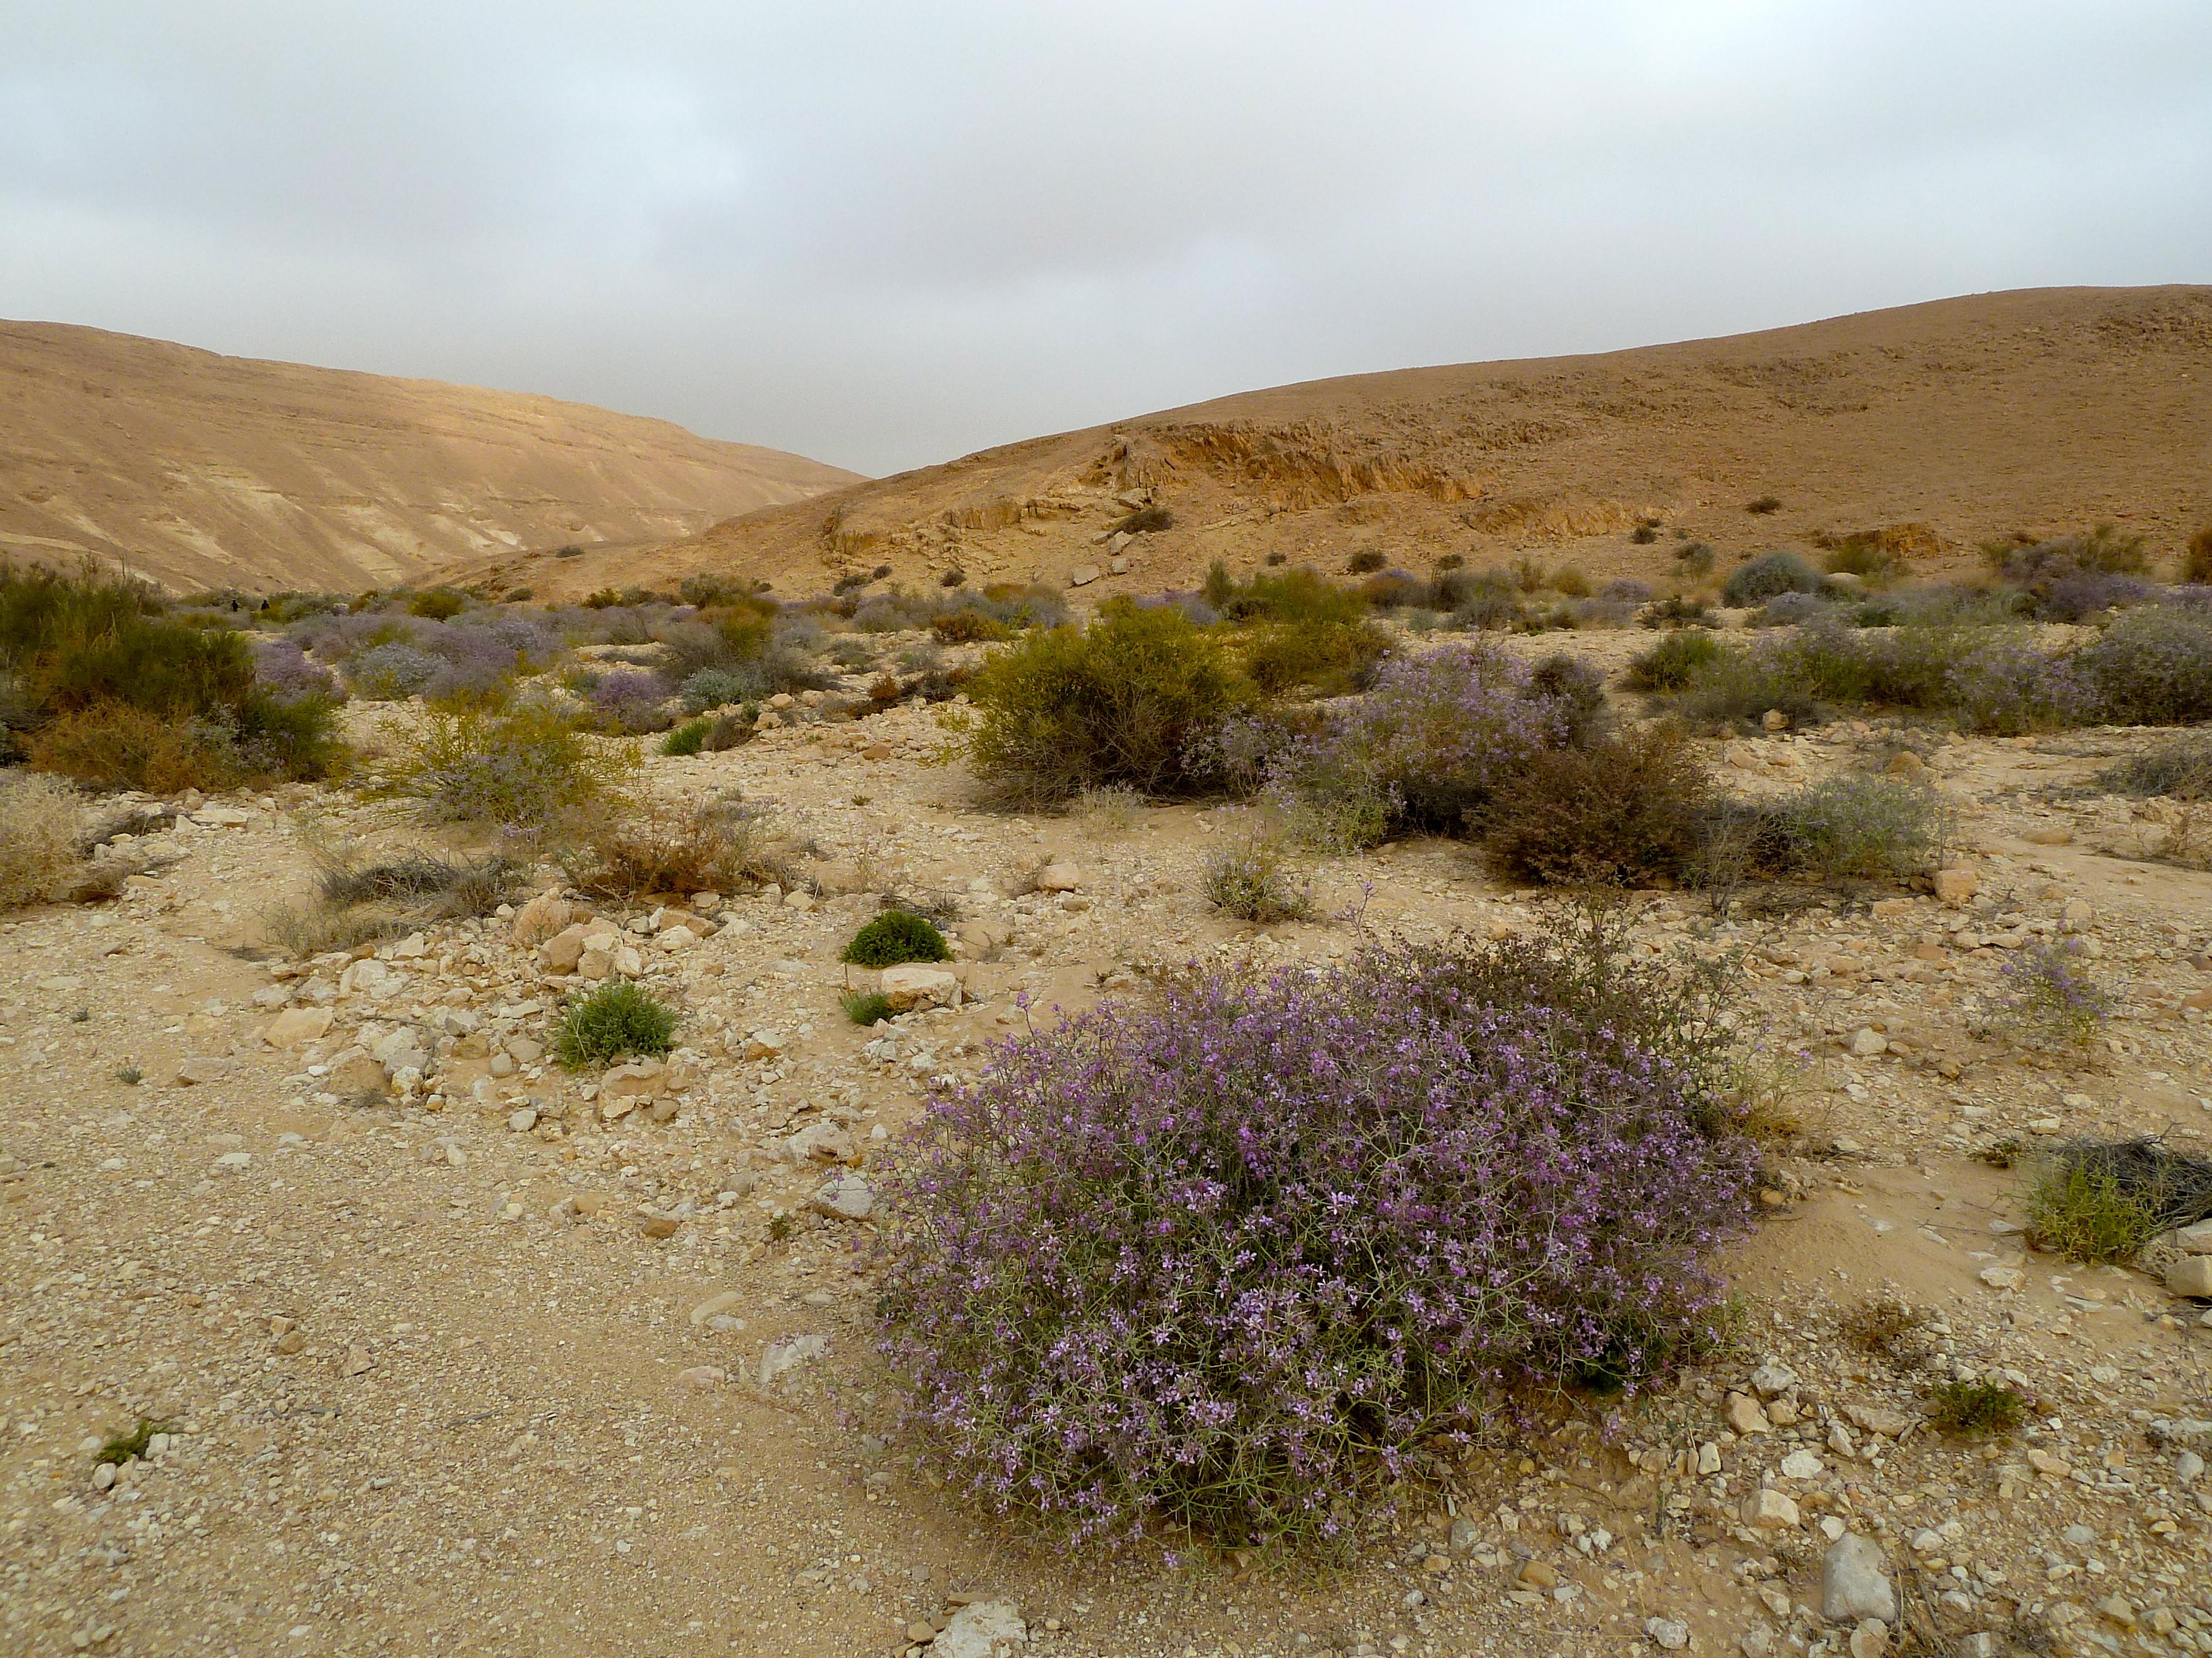 Desert israel tour guide israel tours page 2 for Desert landscape